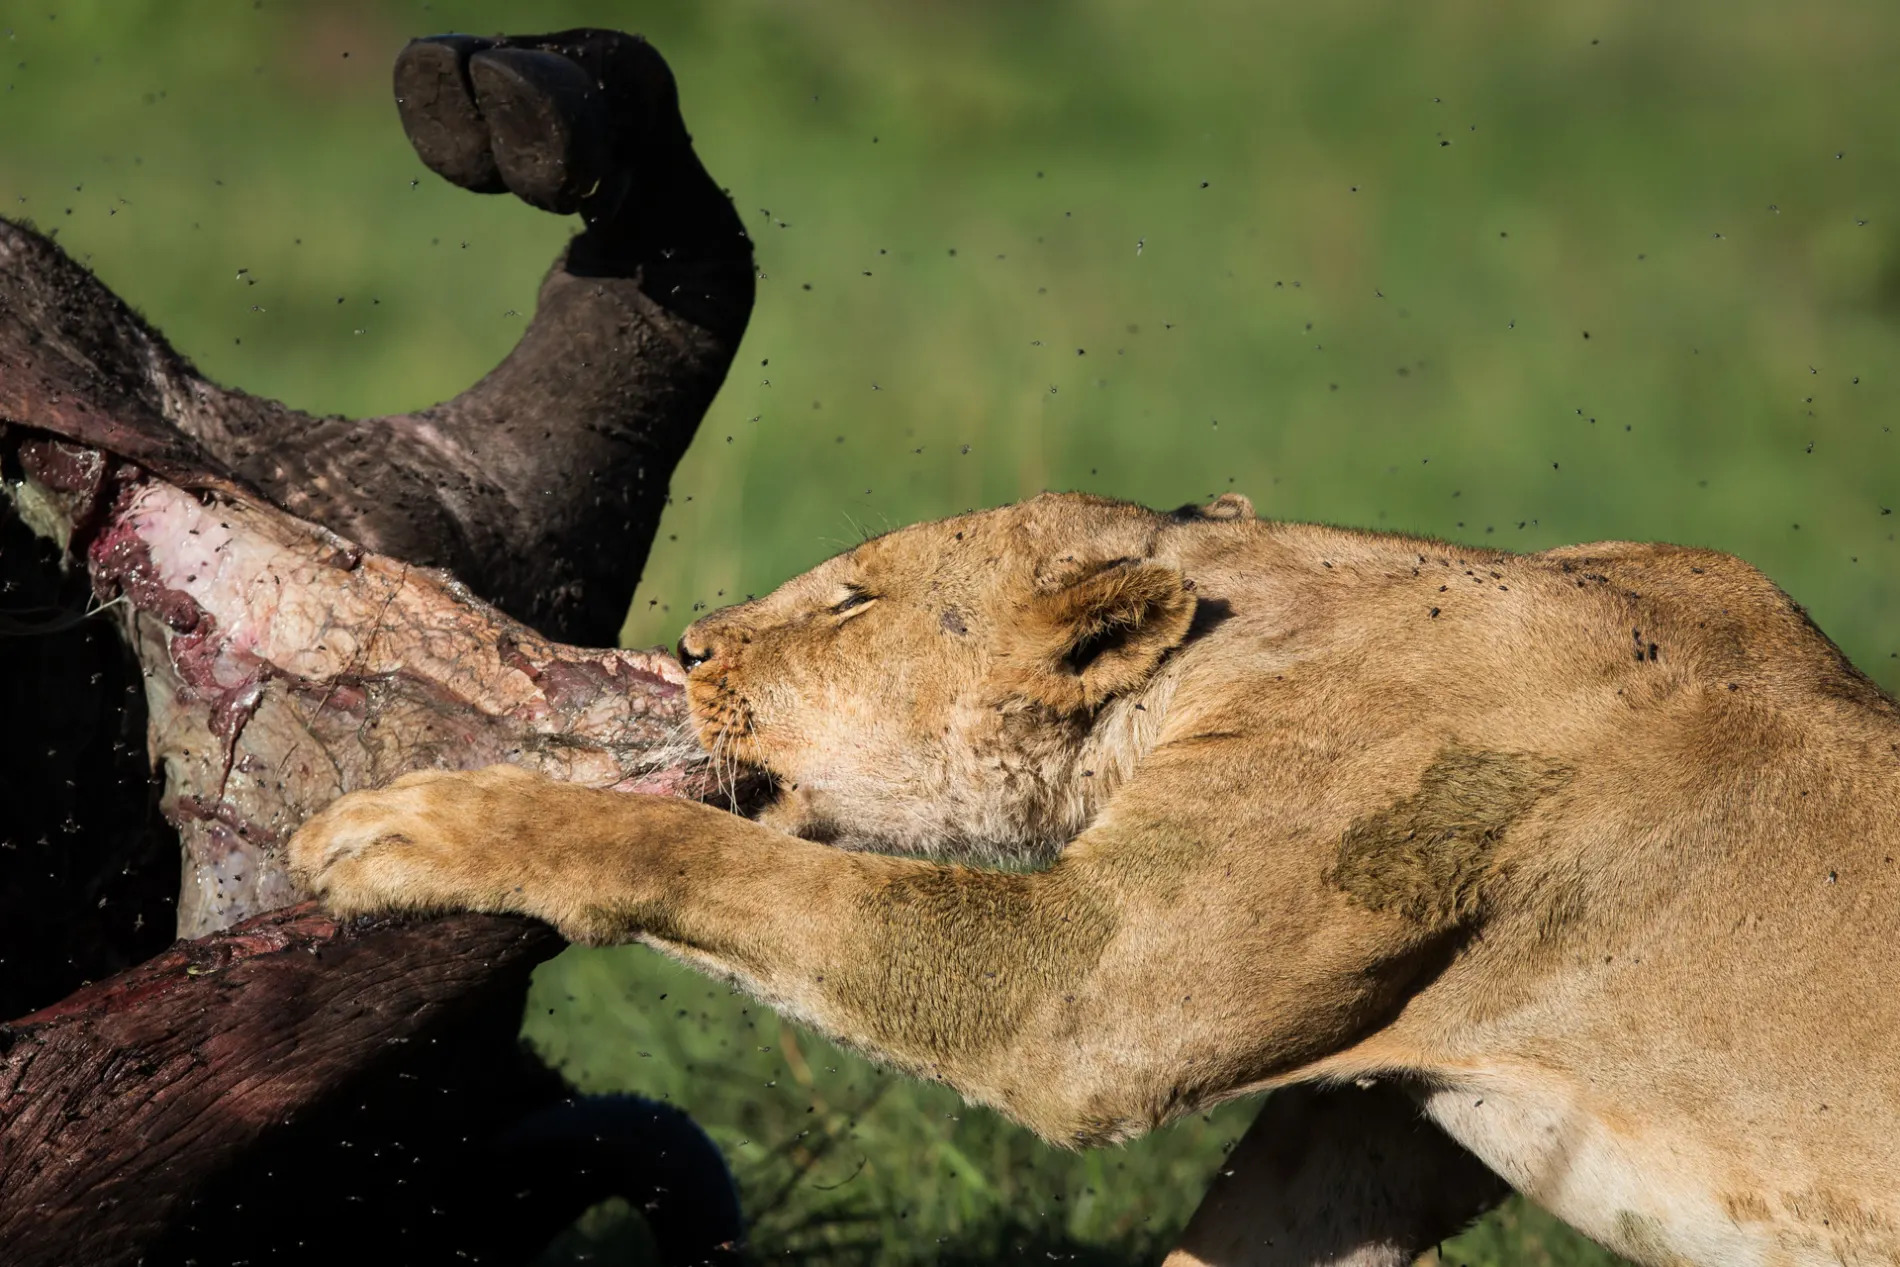 Lioness feeding